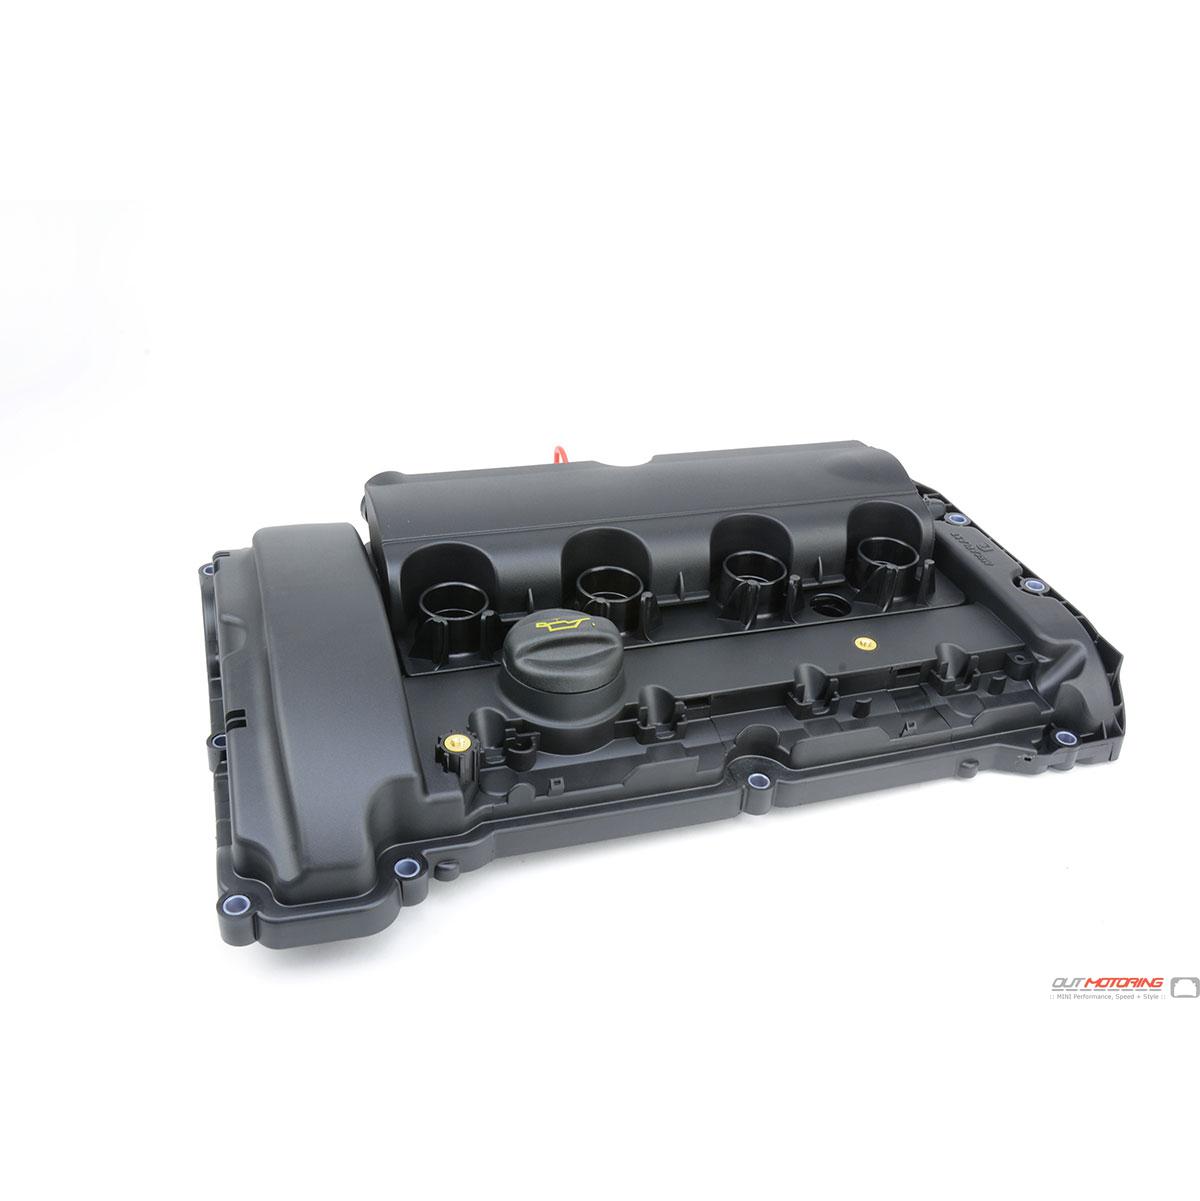 MINI Cooper S Valve Cover: N14